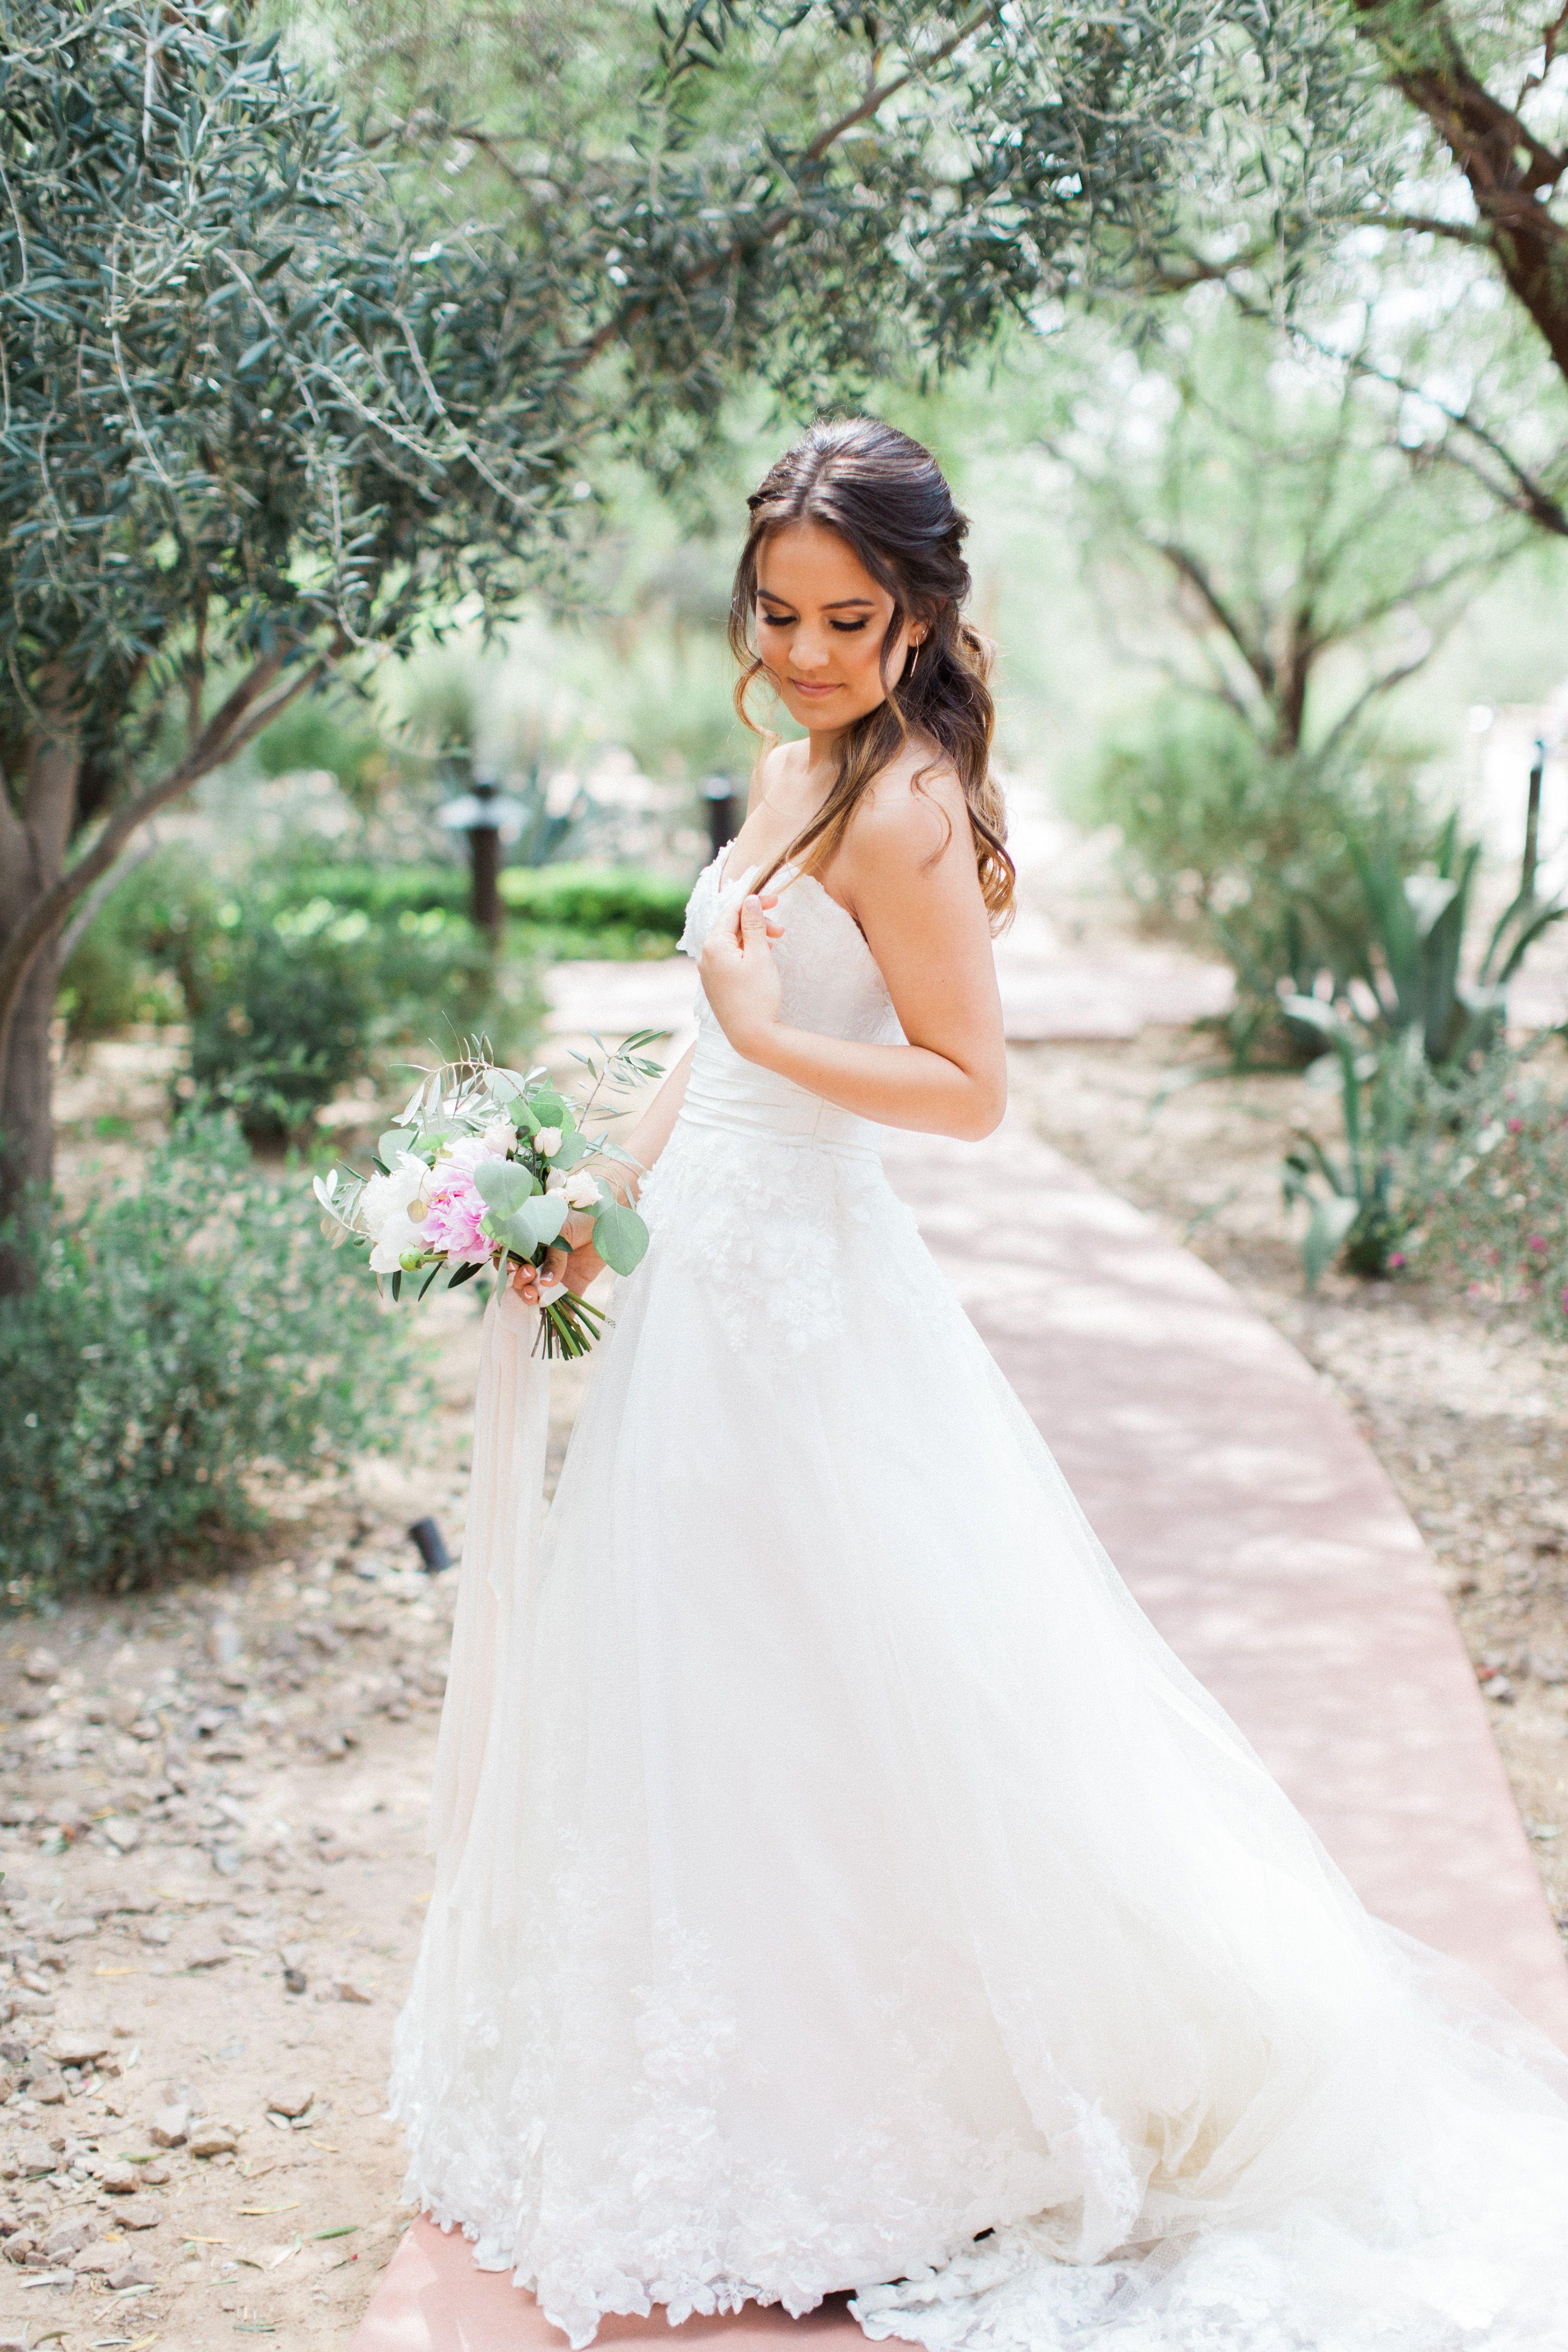 REVEL WEDDING CO   PINKERTON PHOTOGRAPHY   + ALL DRESSED UP + ...